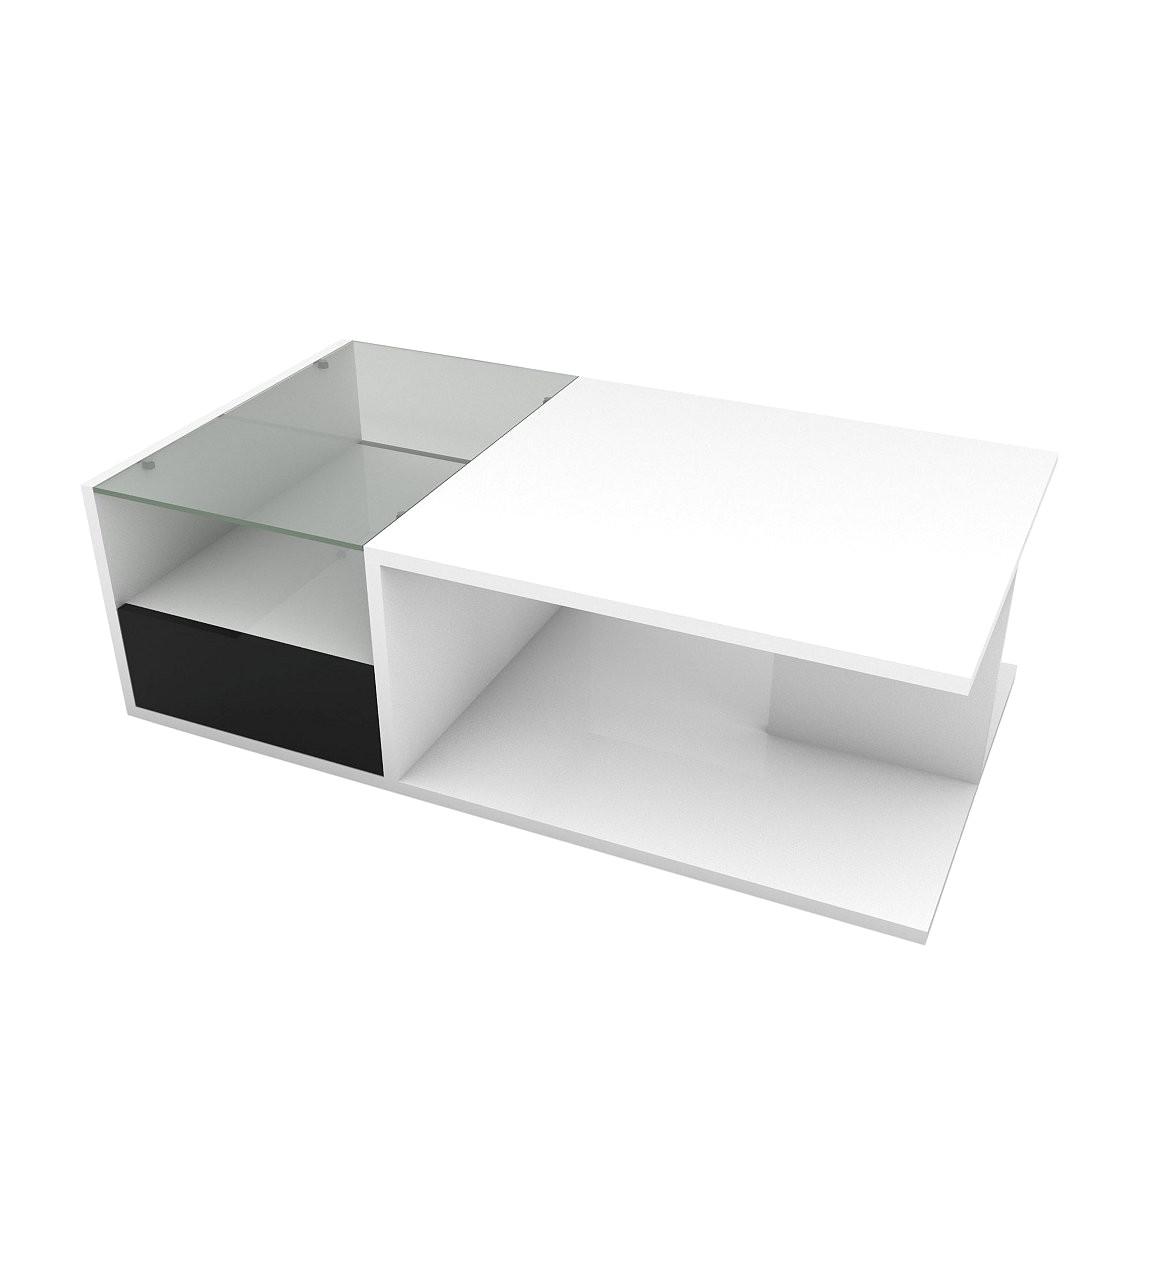 table basse qui se releve pas cher maison. Black Bedroom Furniture Sets. Home Design Ideas